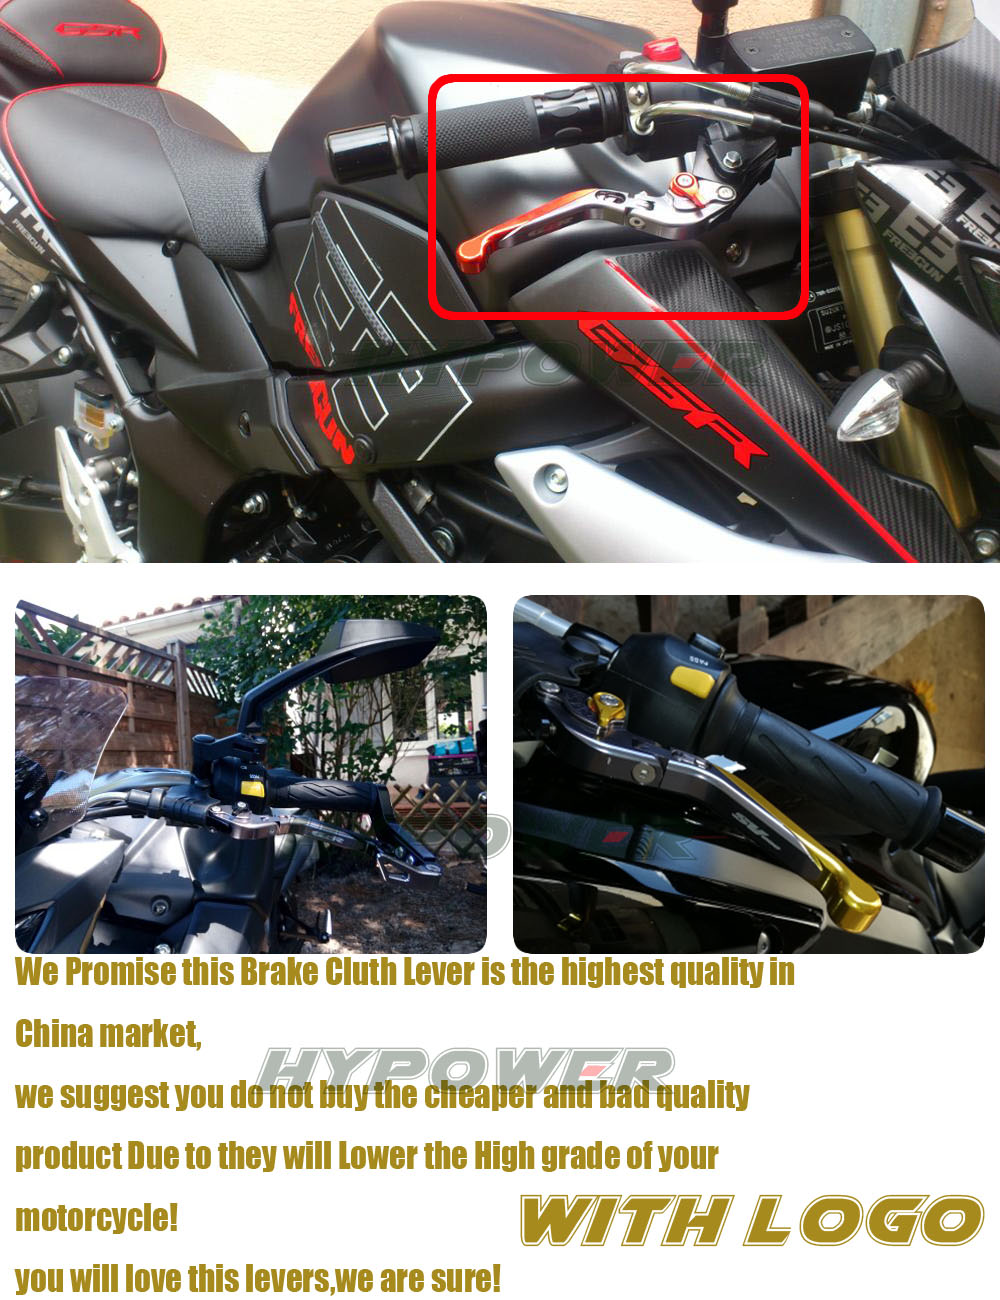 2015 2016 acessórios da motocicleta folding extensível